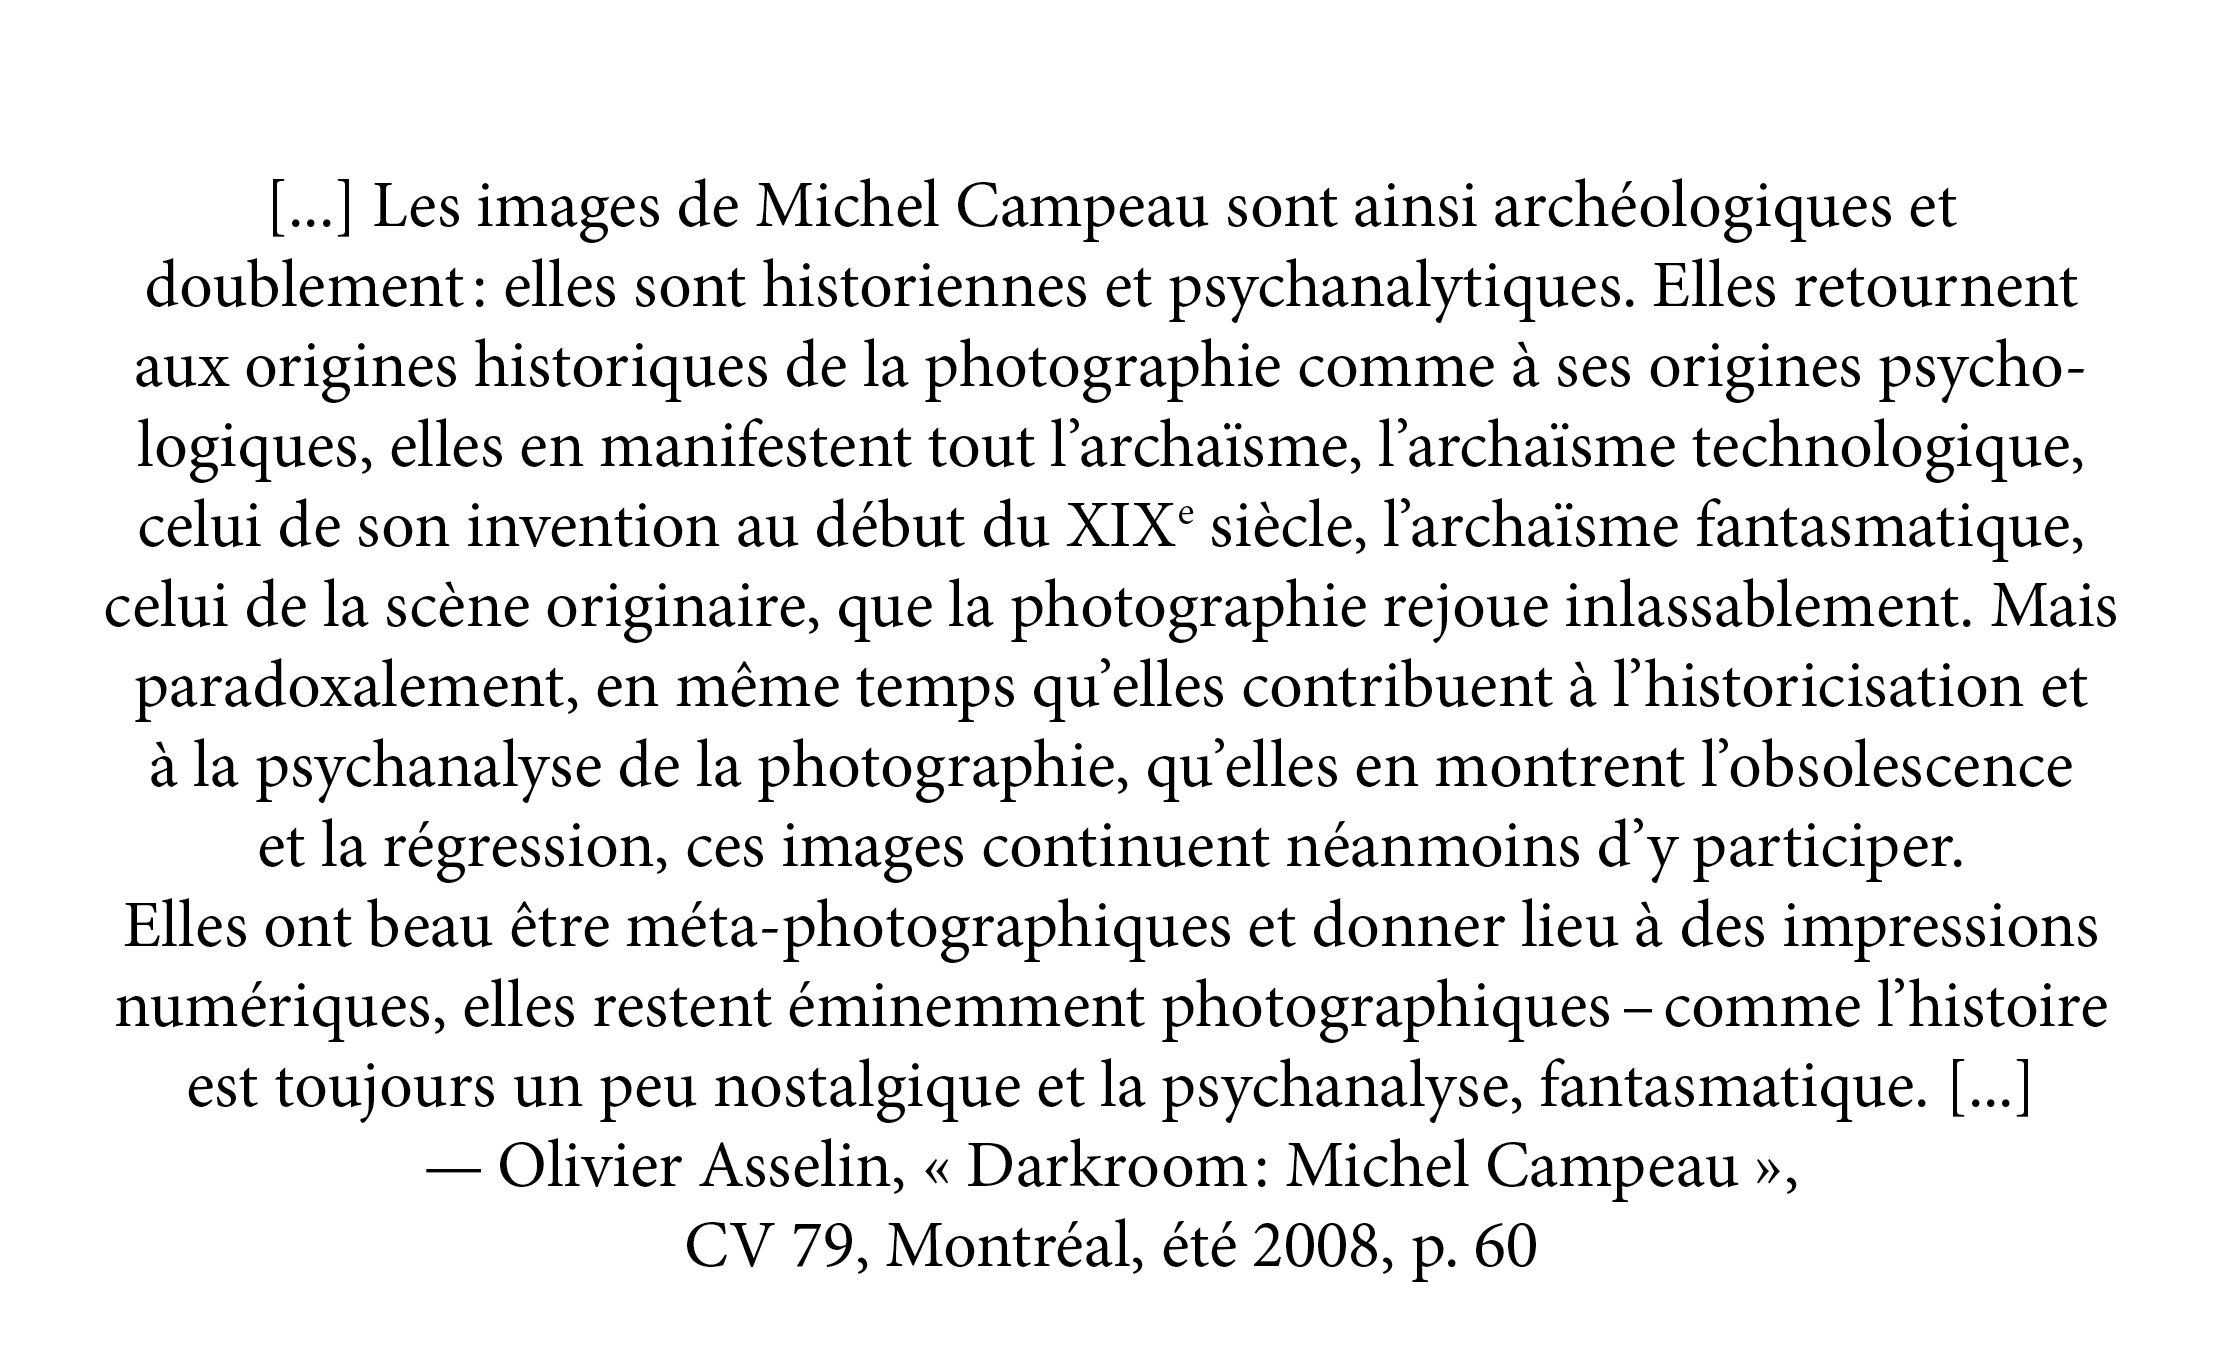 084_Olivier Asselin-1.jpg